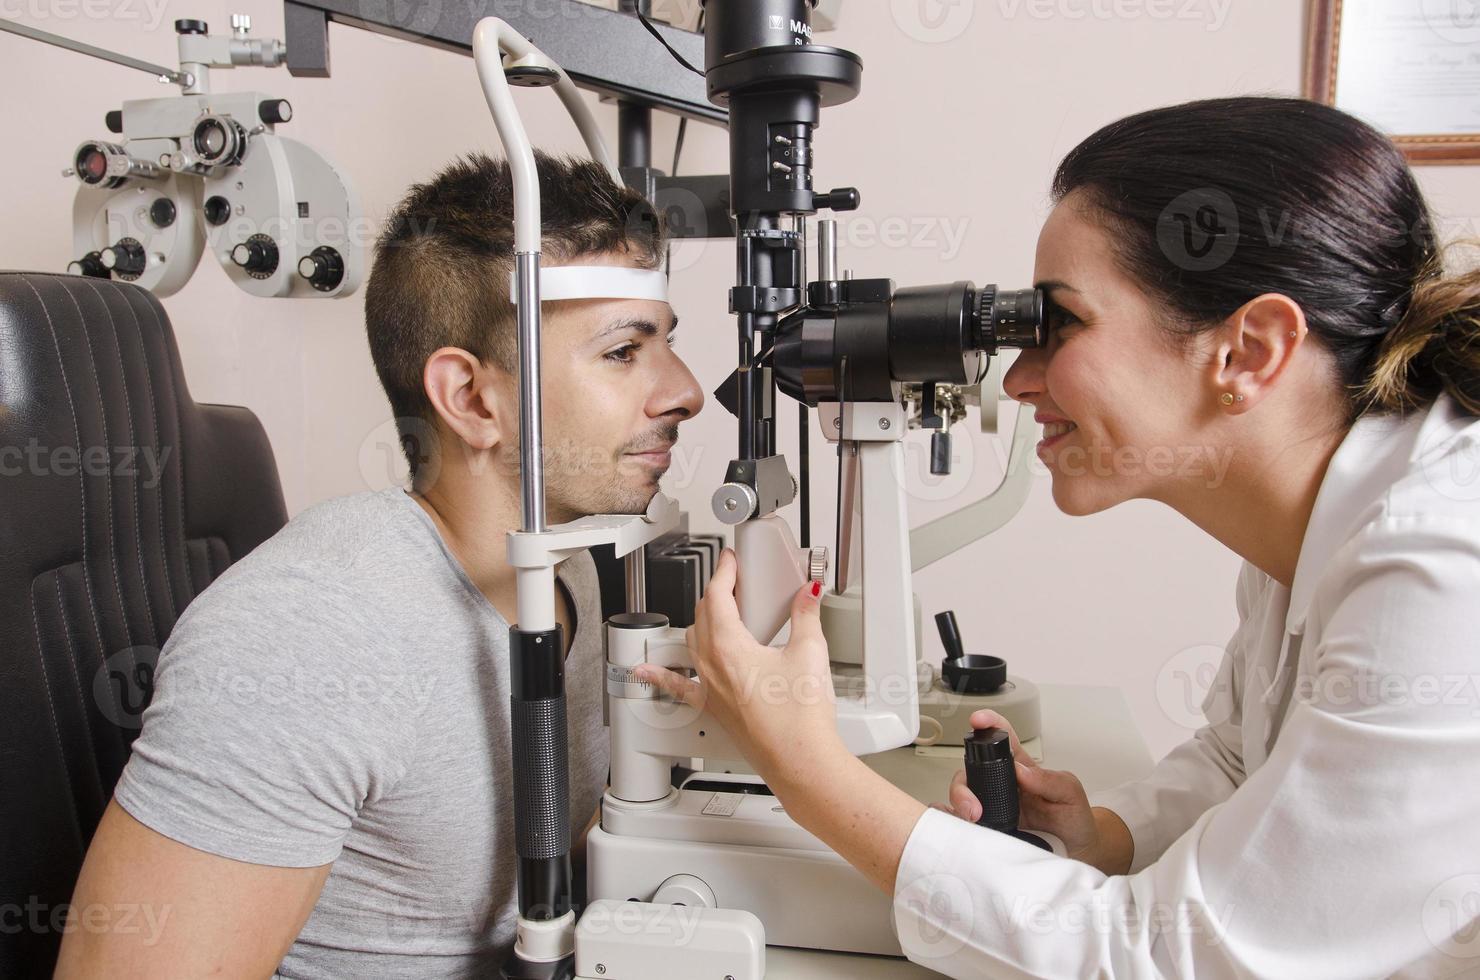 examen óptico a joven, mujer profesional foto